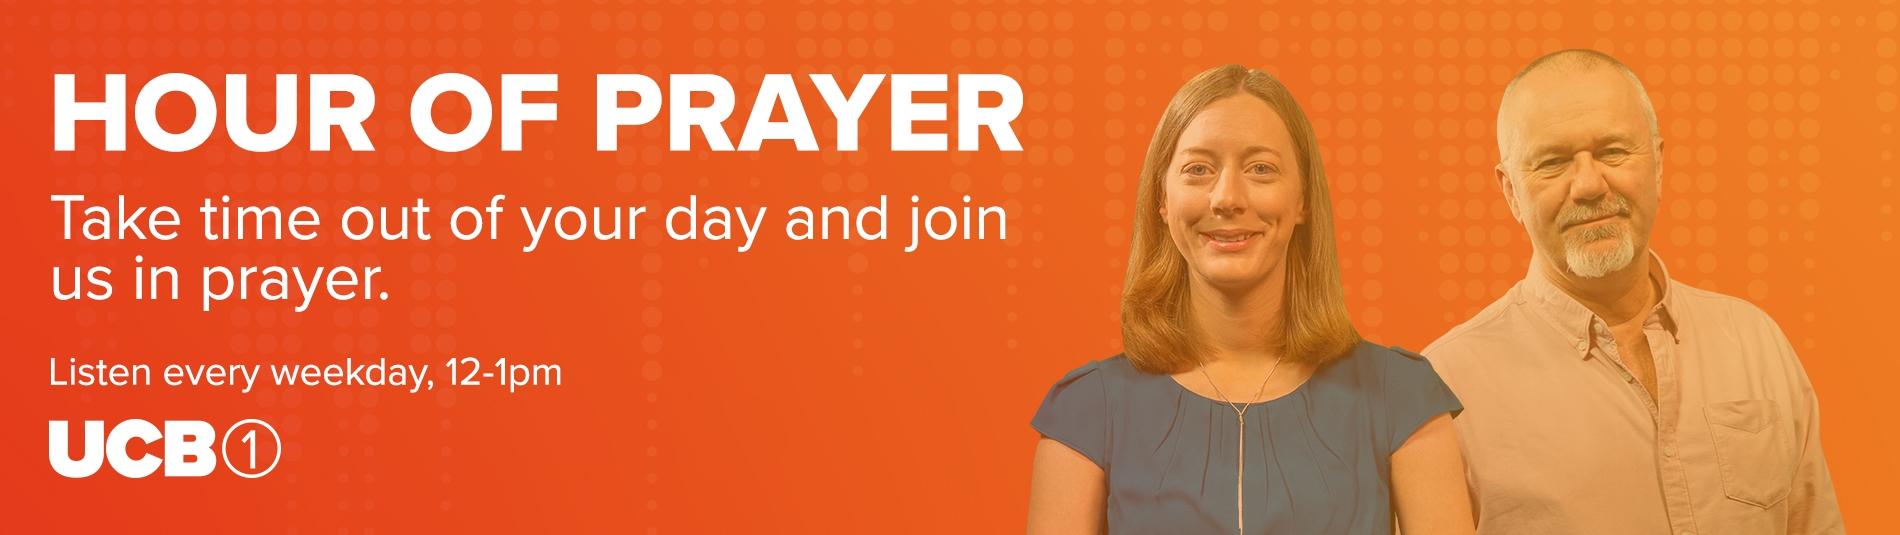 Hour of Prayer - Listen every weekday, 12-1pm